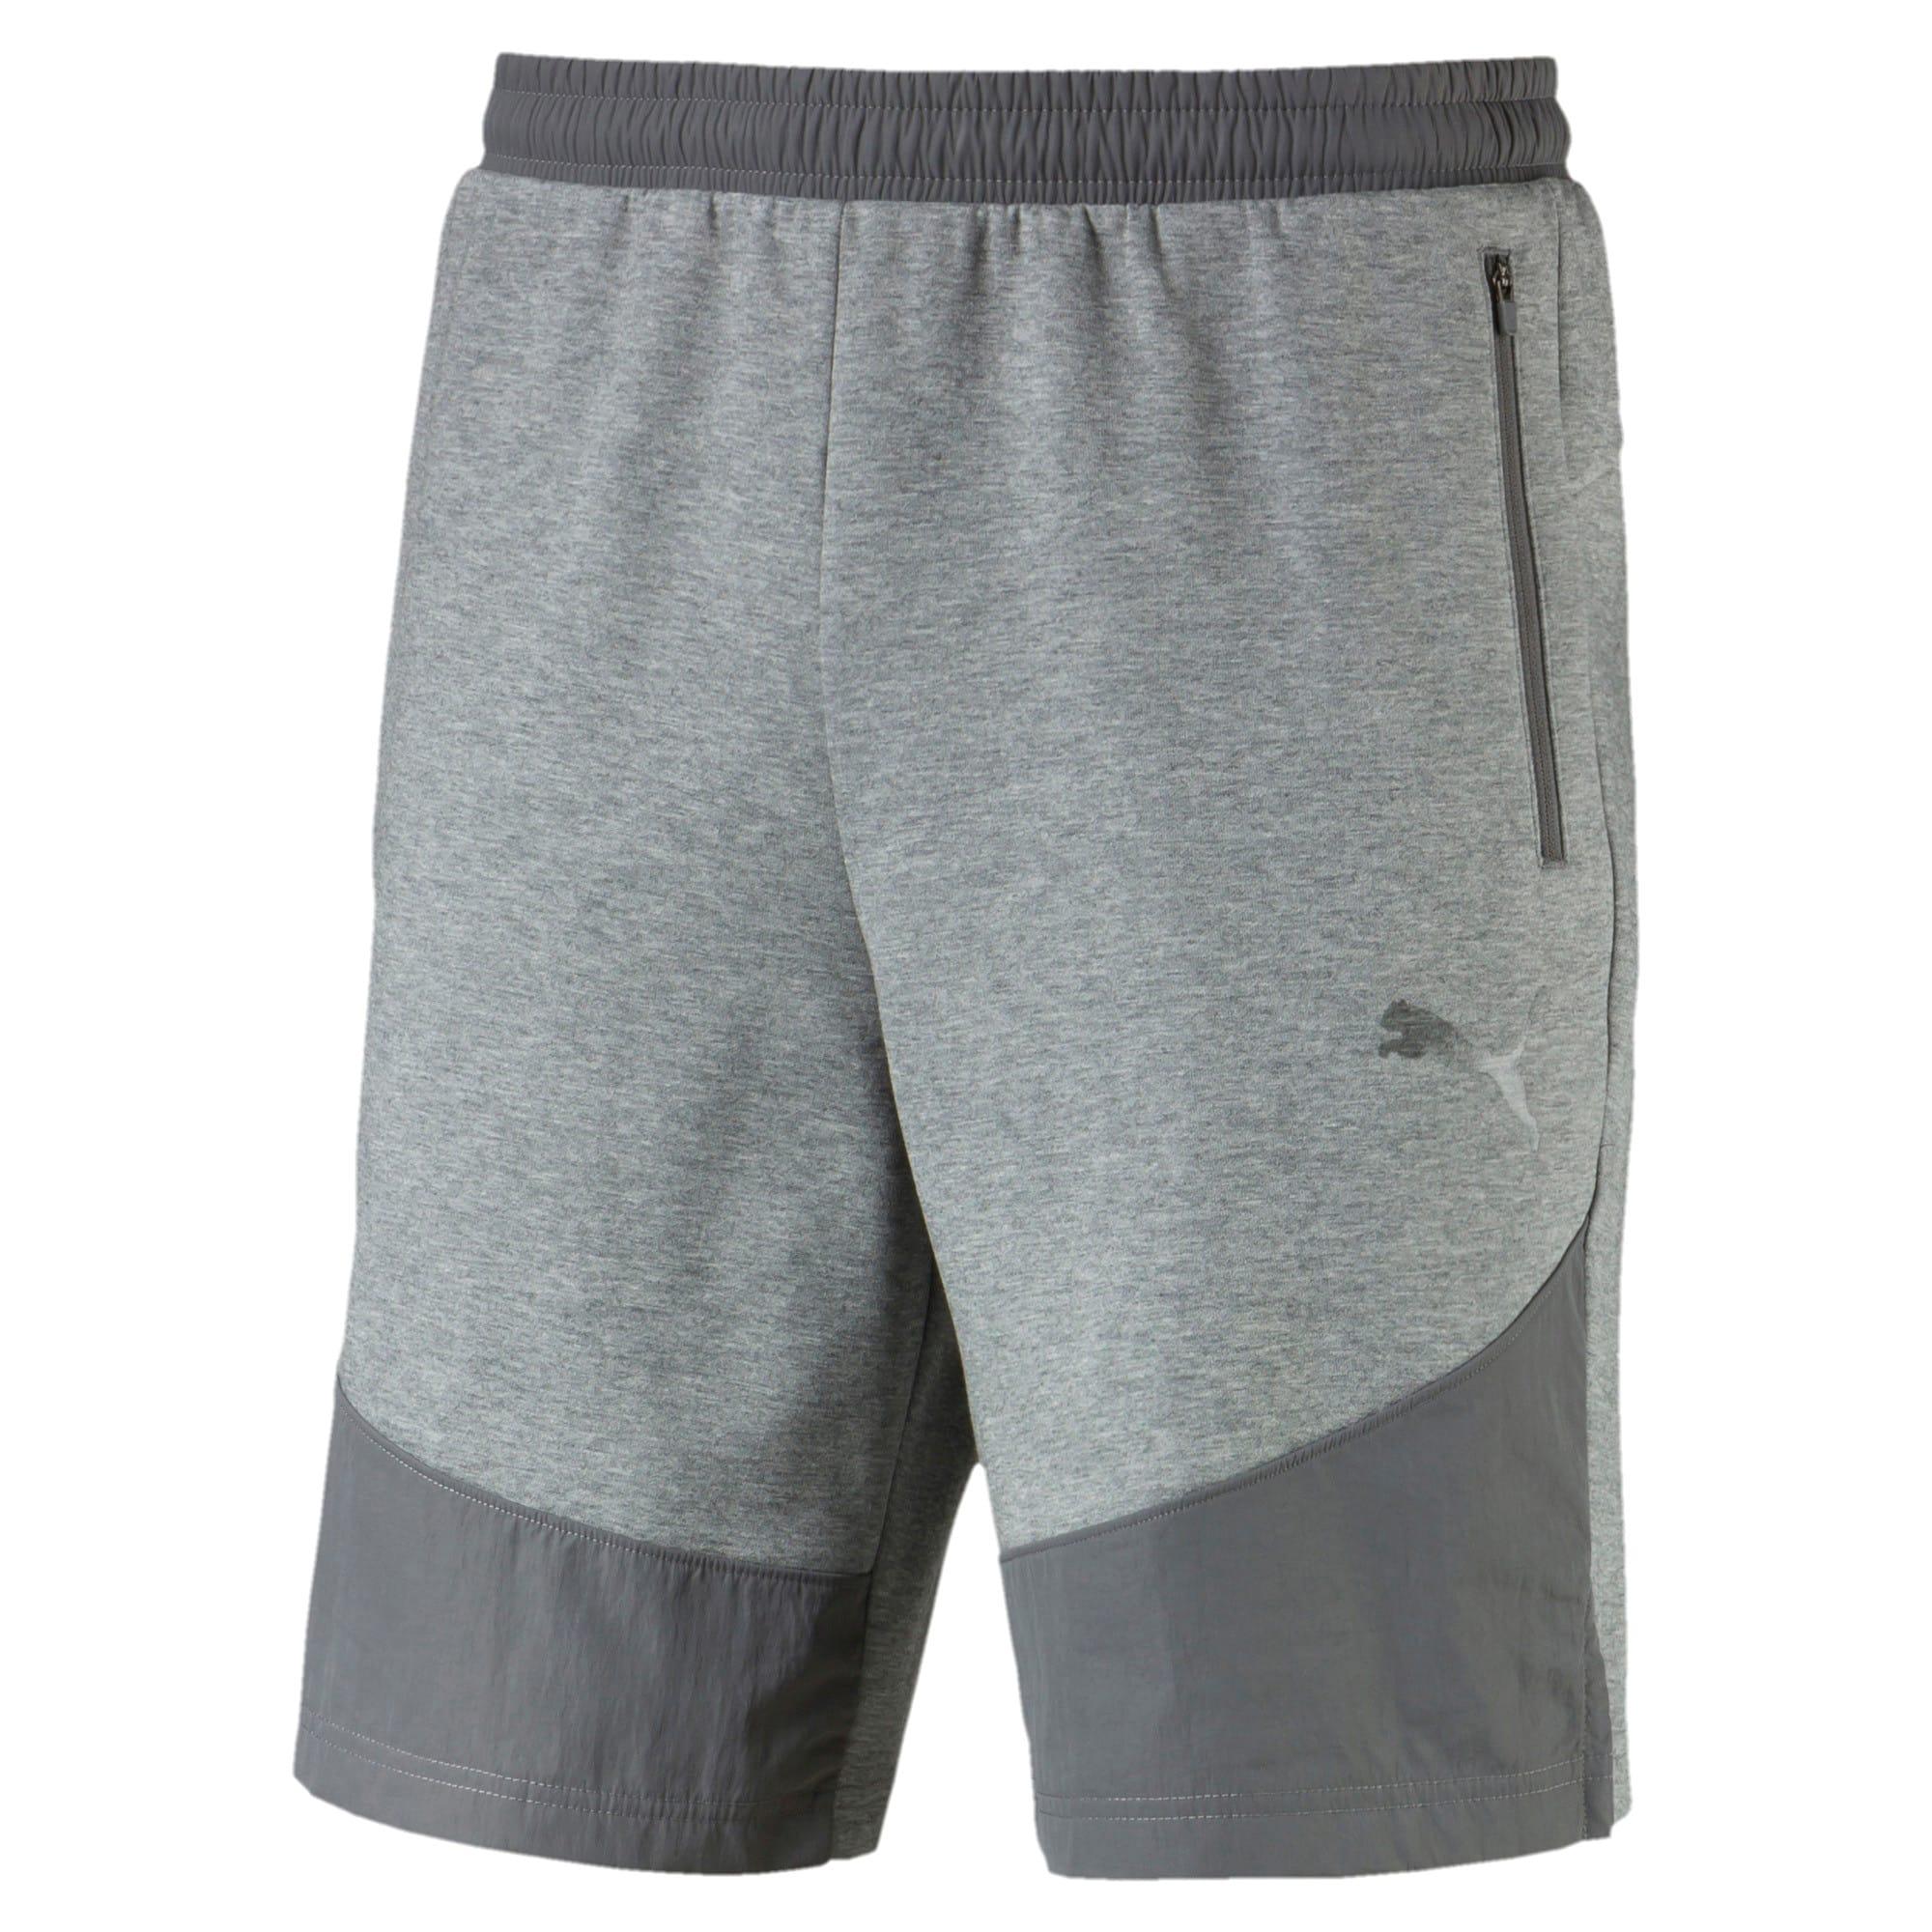 Thumbnail 2 of Evostripe Lite Men's Shorts, Medium Gray Heather, medium